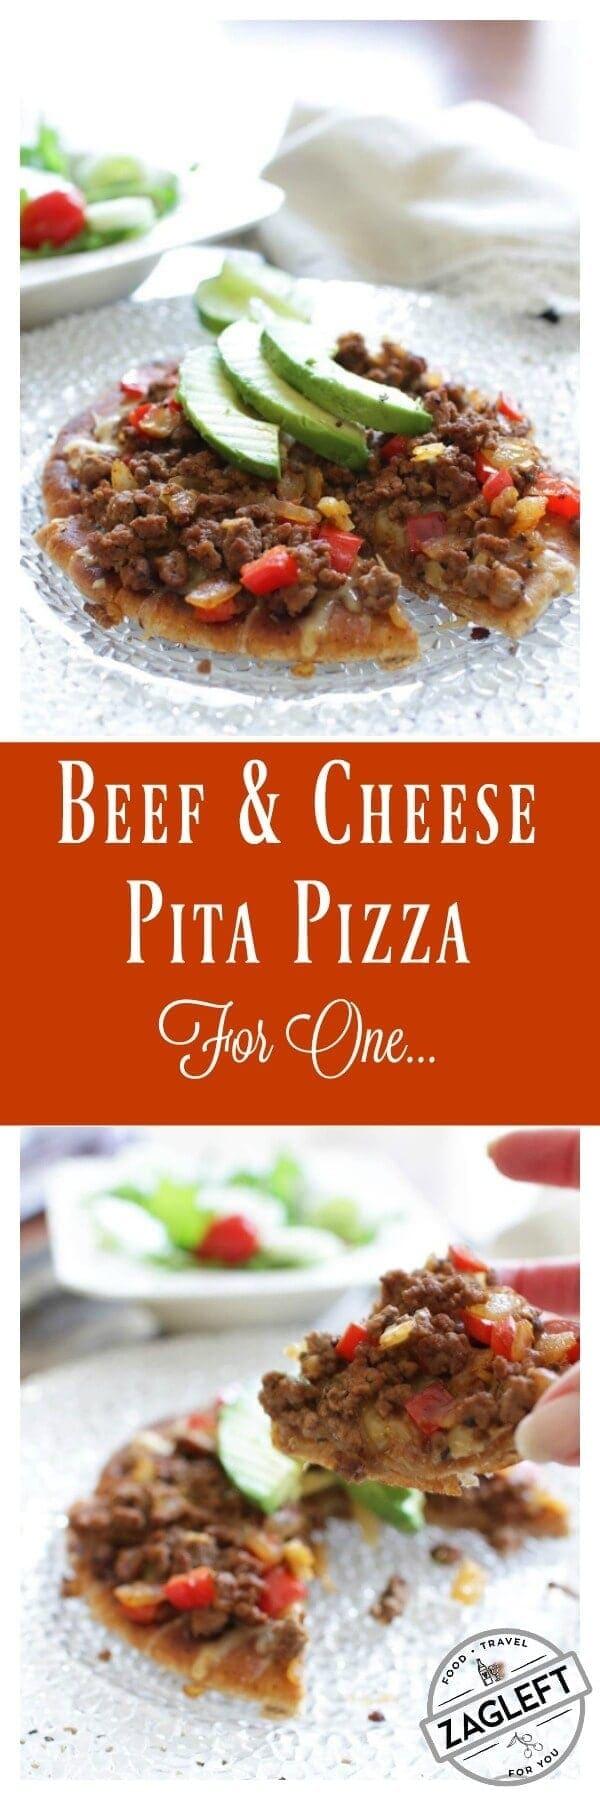 Beef and Cheese Pita Pizza ZagLeft